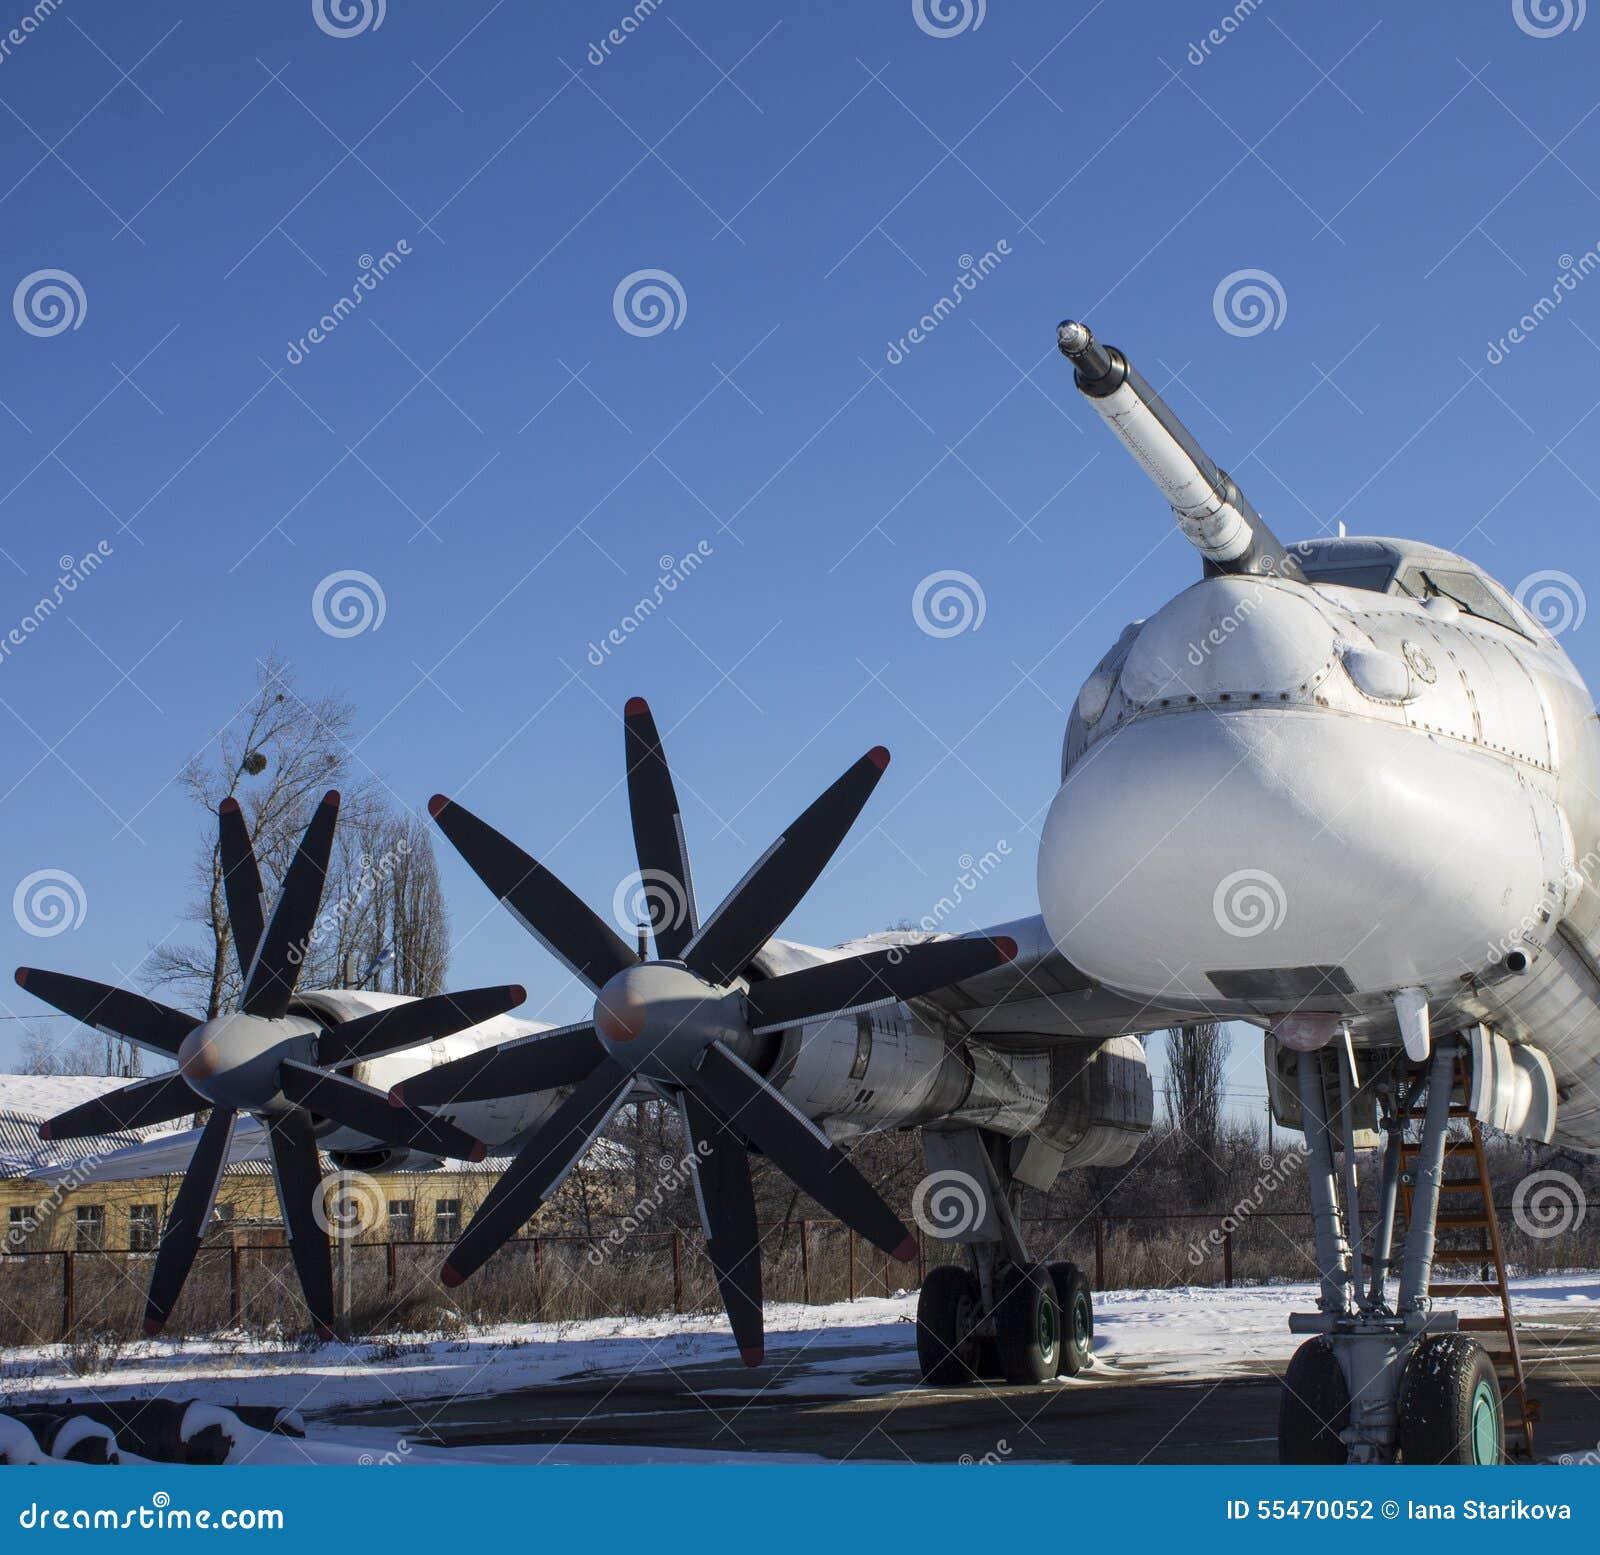 Tupolev Tu-95 auf Ukraine-Luftfahrt-Museum, Poltava